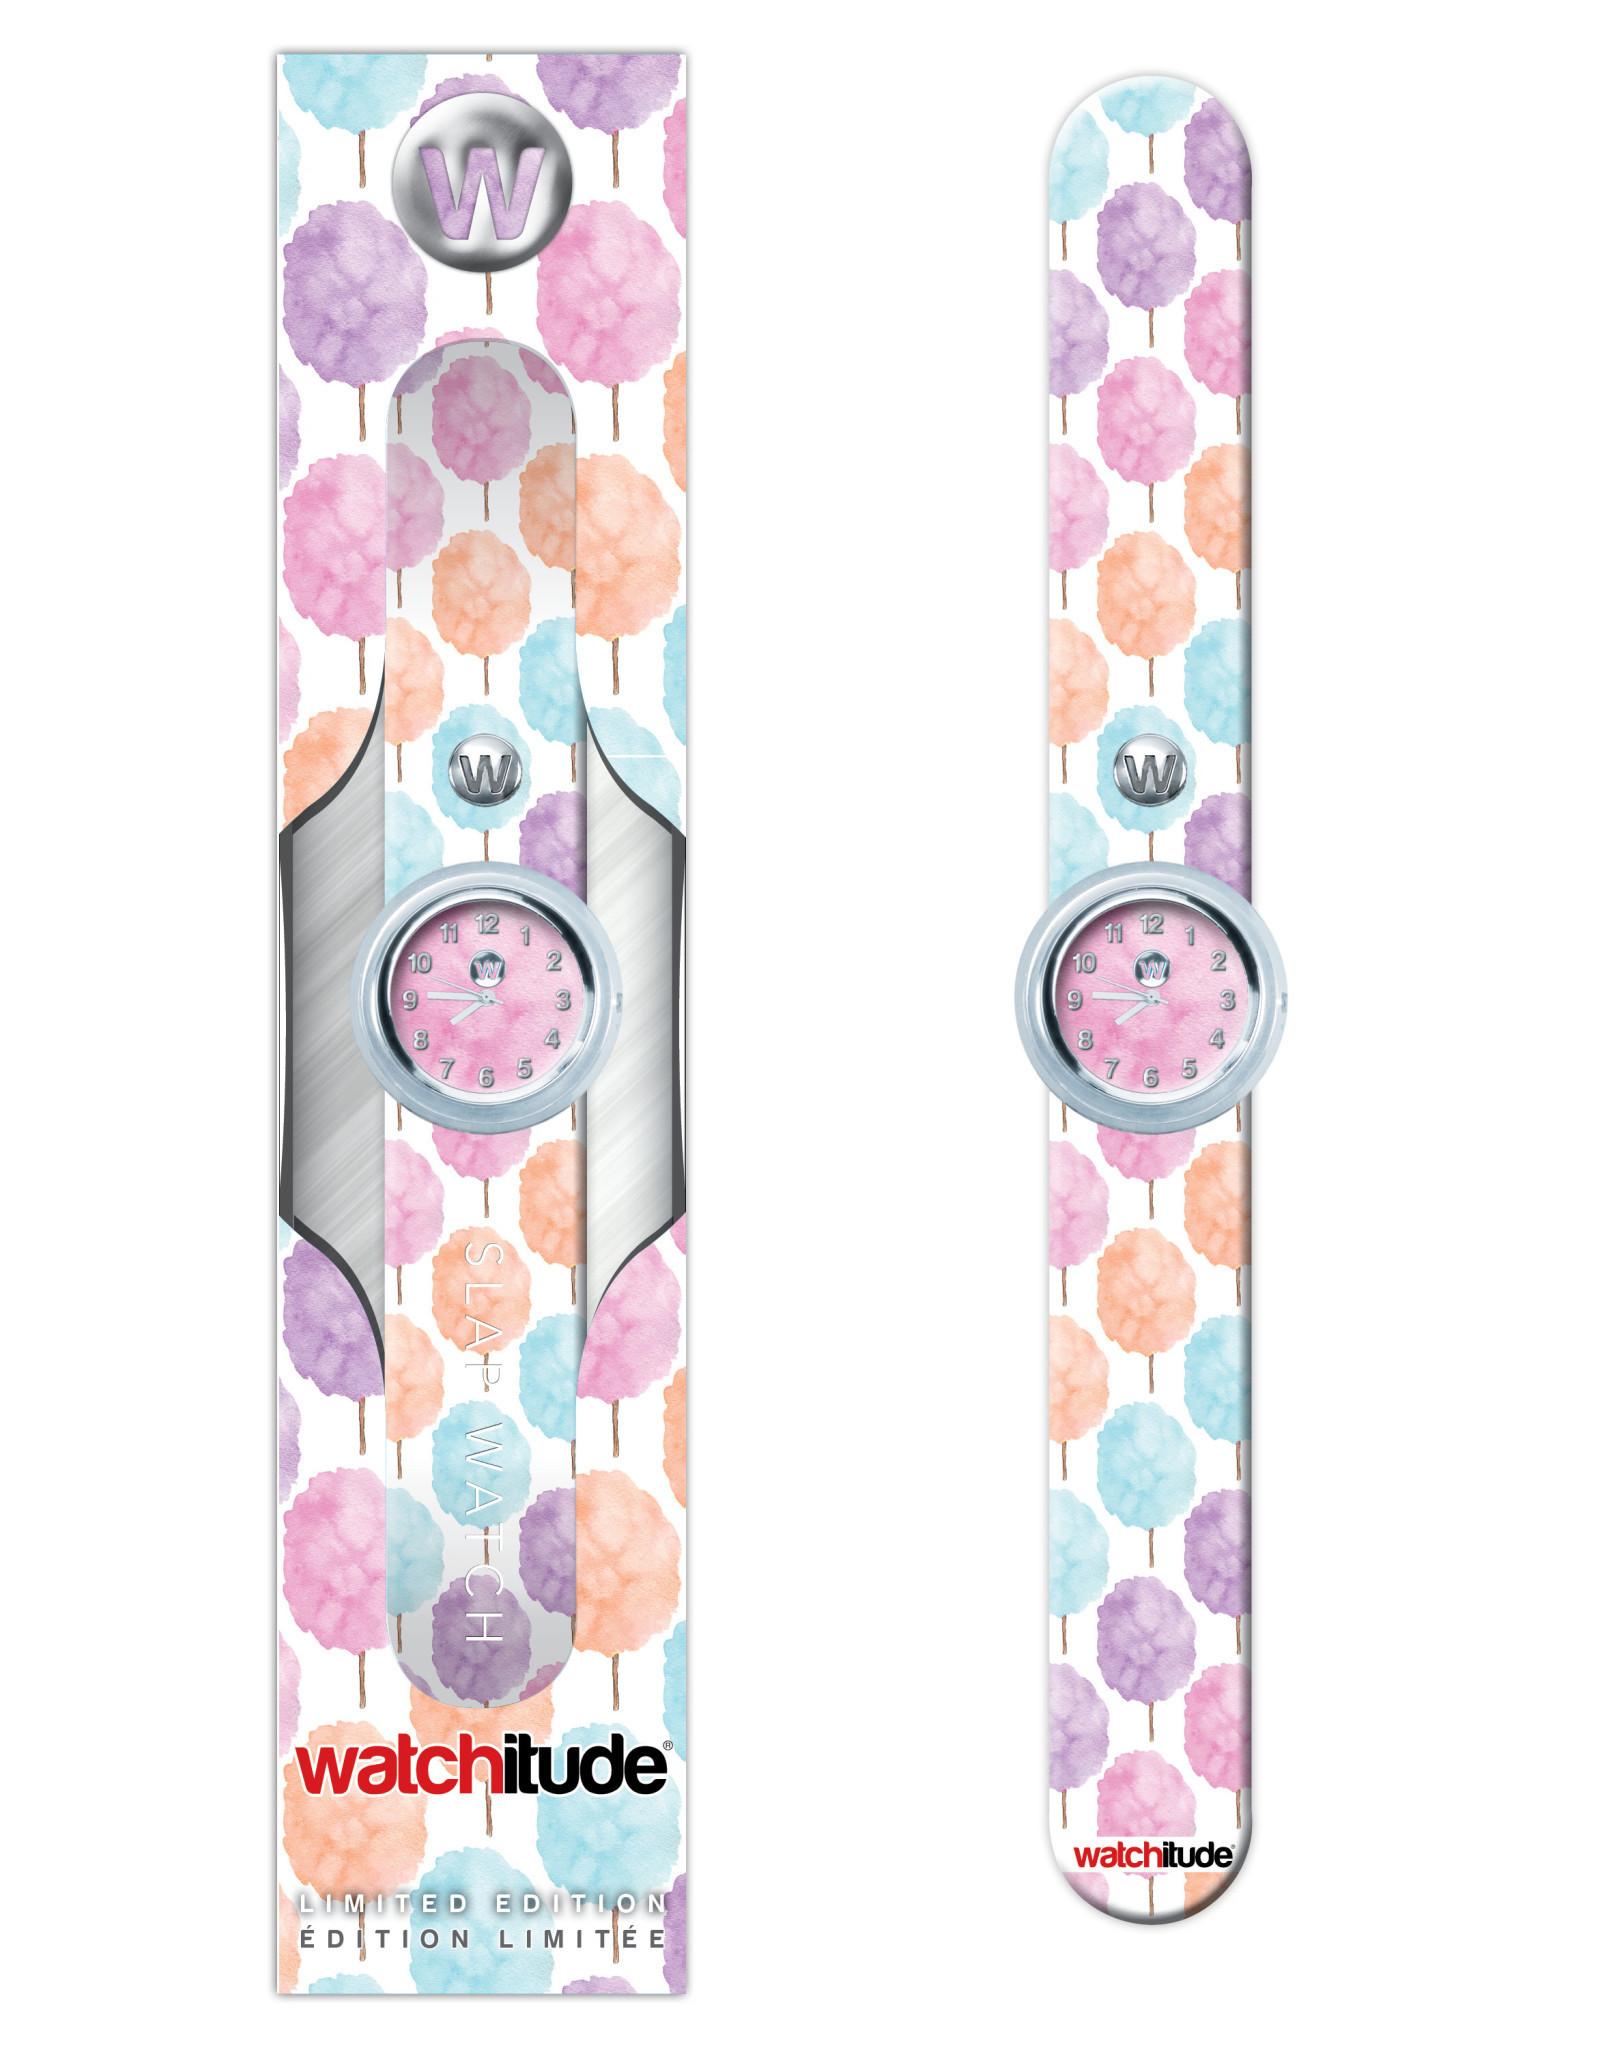 Watchitude Cotton Candy -  Slap Watch